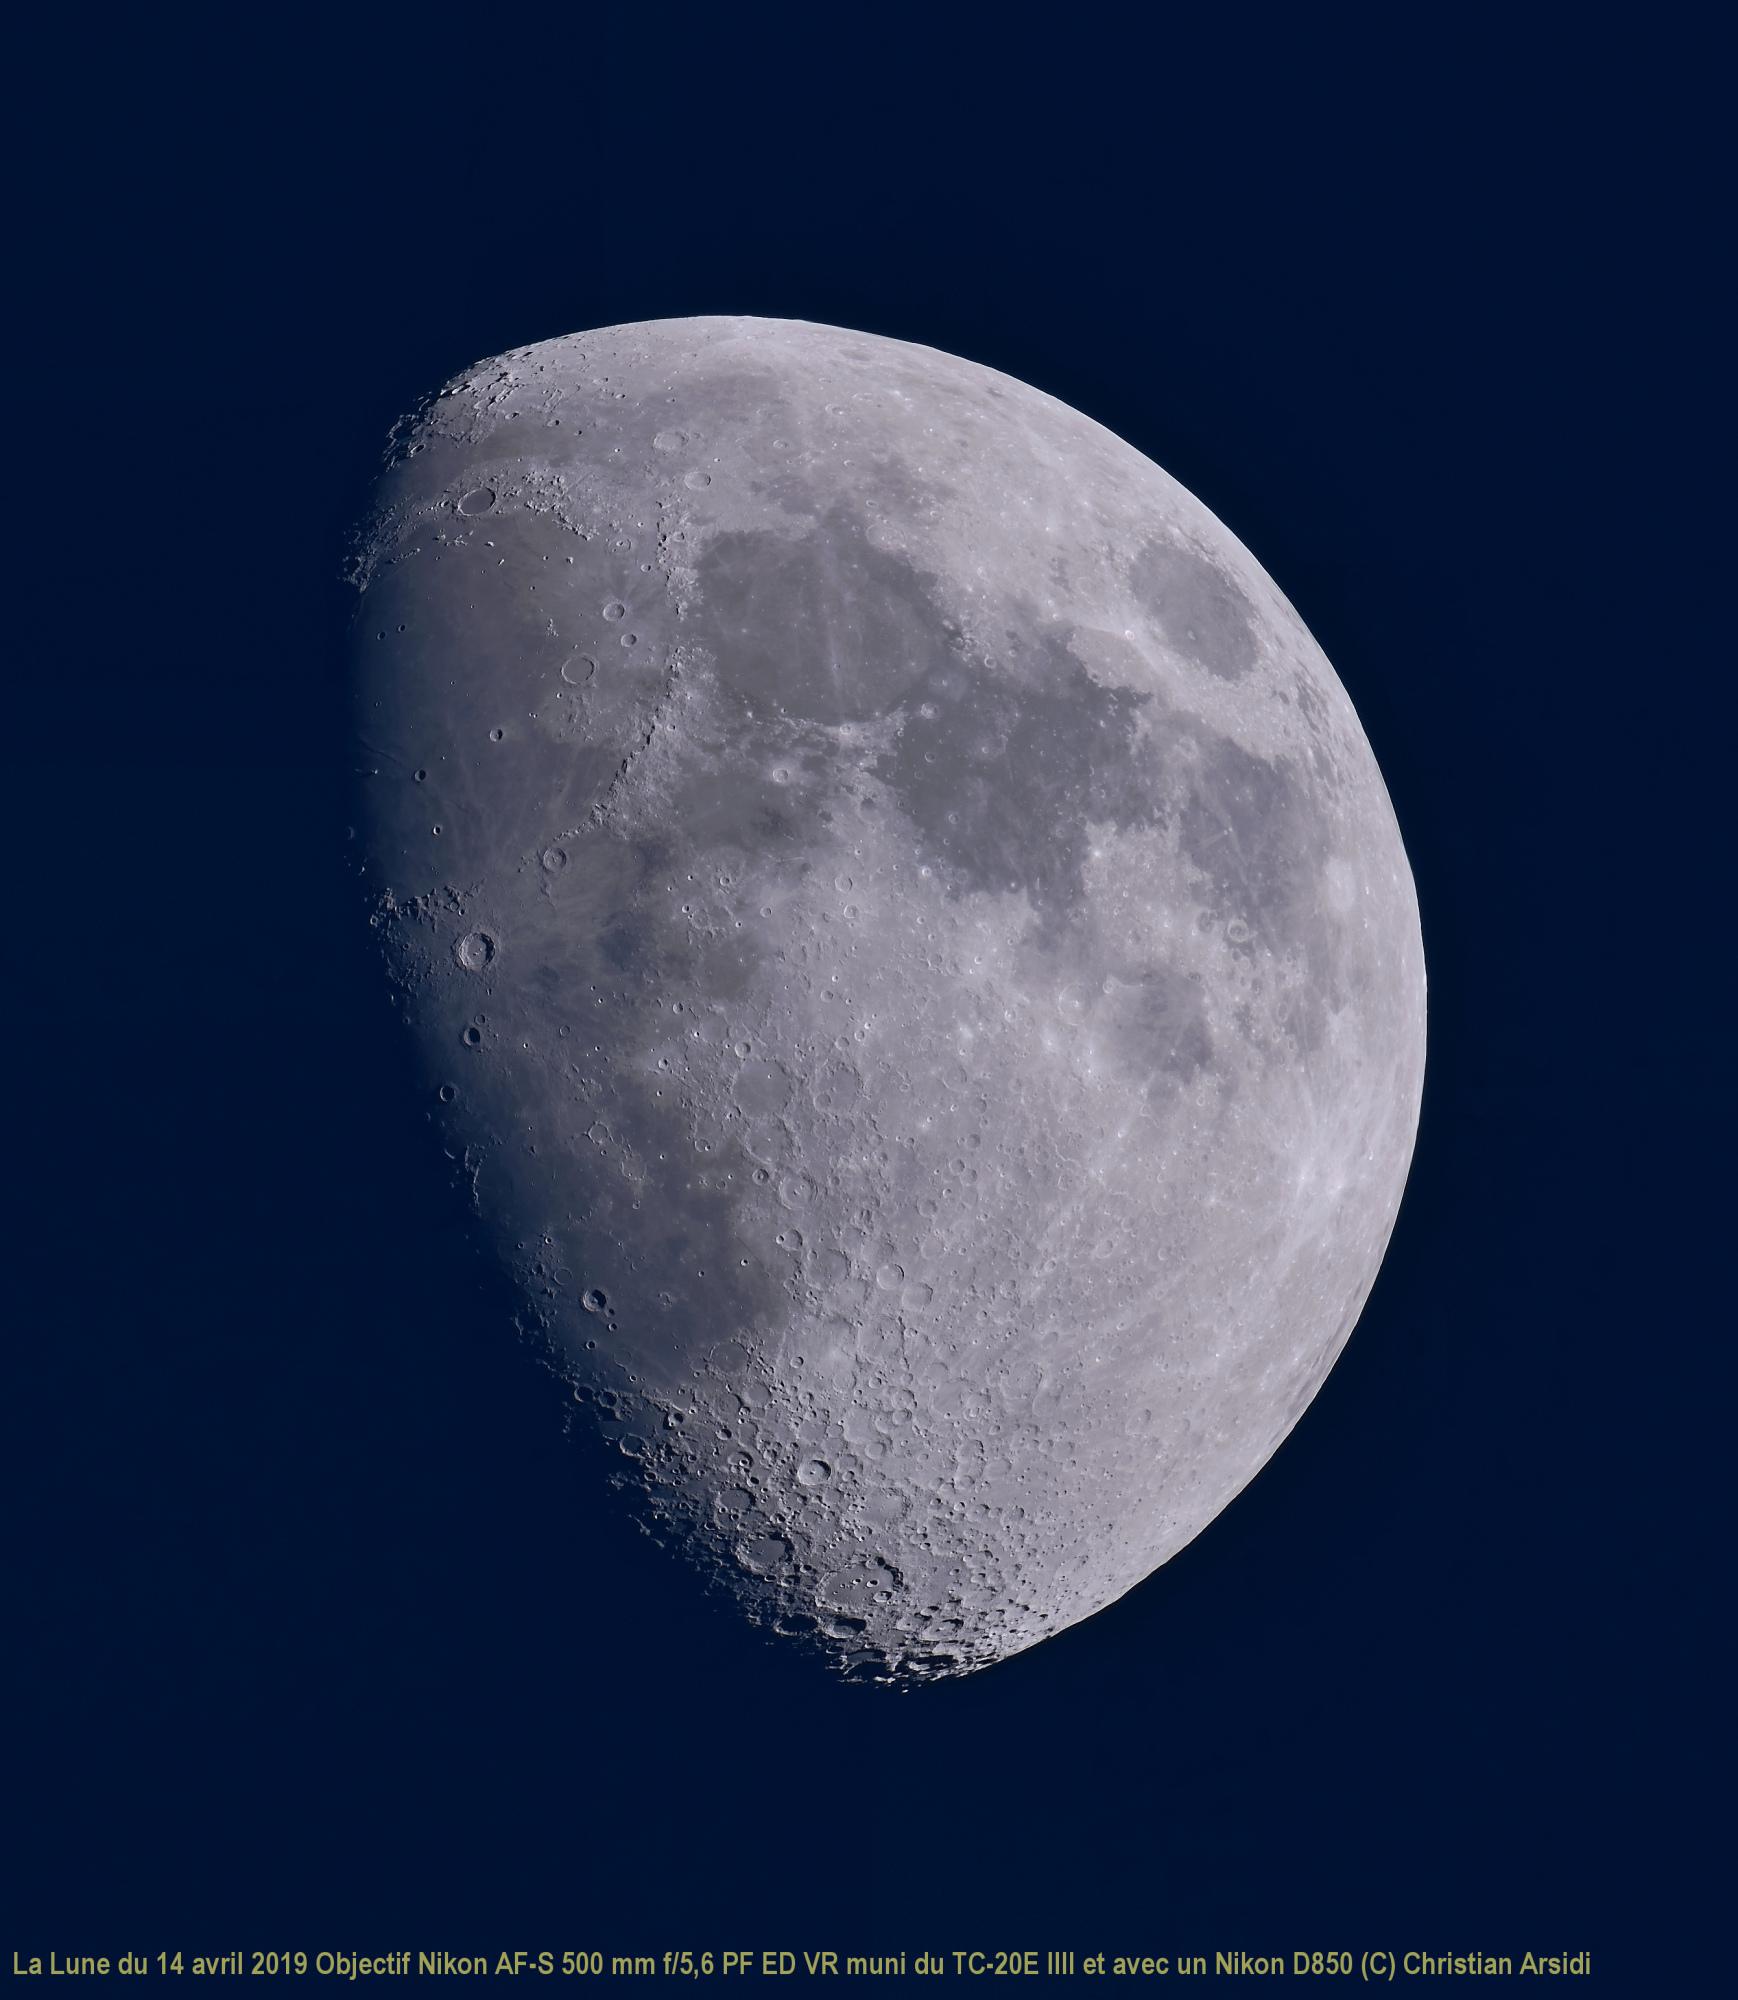 La Lune 35 images BV JPEG 100% TTB.jpg